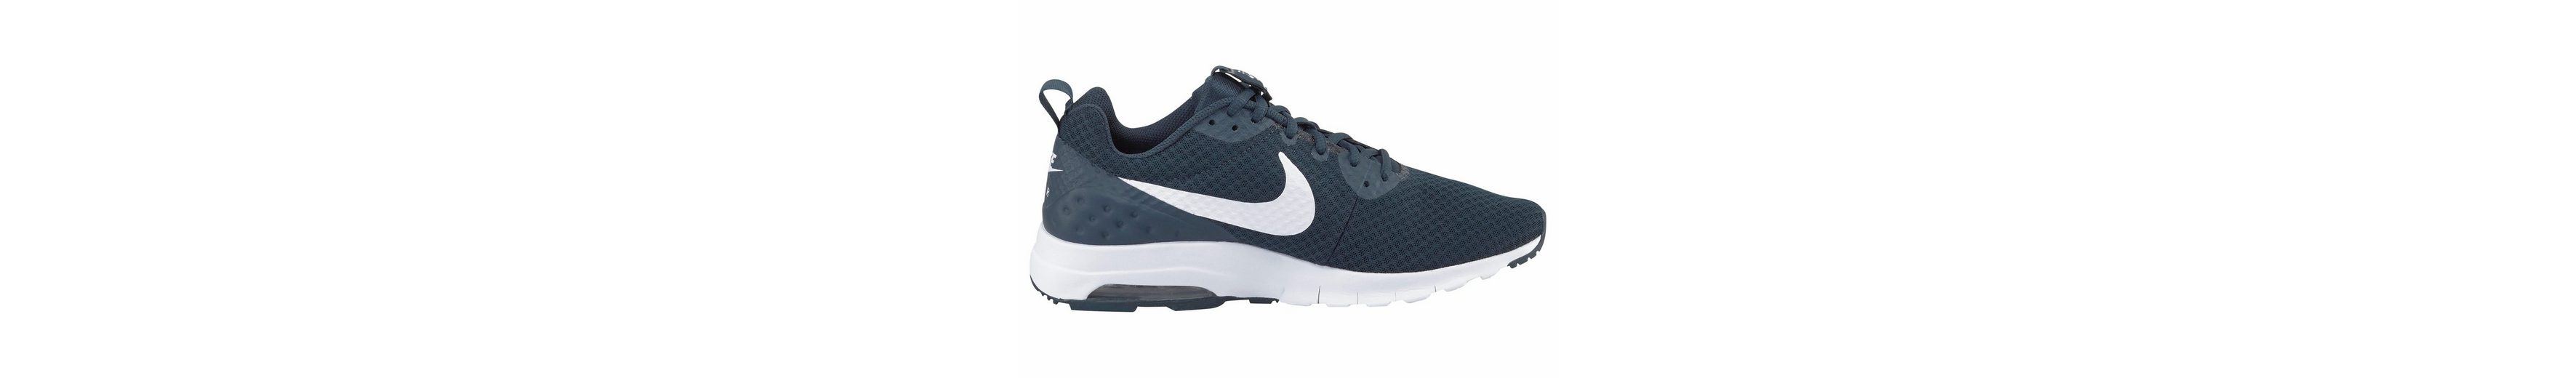 Eastbay Günstigen Preis Nike Sportswear Air Max Motion LW Sneaker Verkauf Shop-Angebot Billig Klassisch DhRkAK